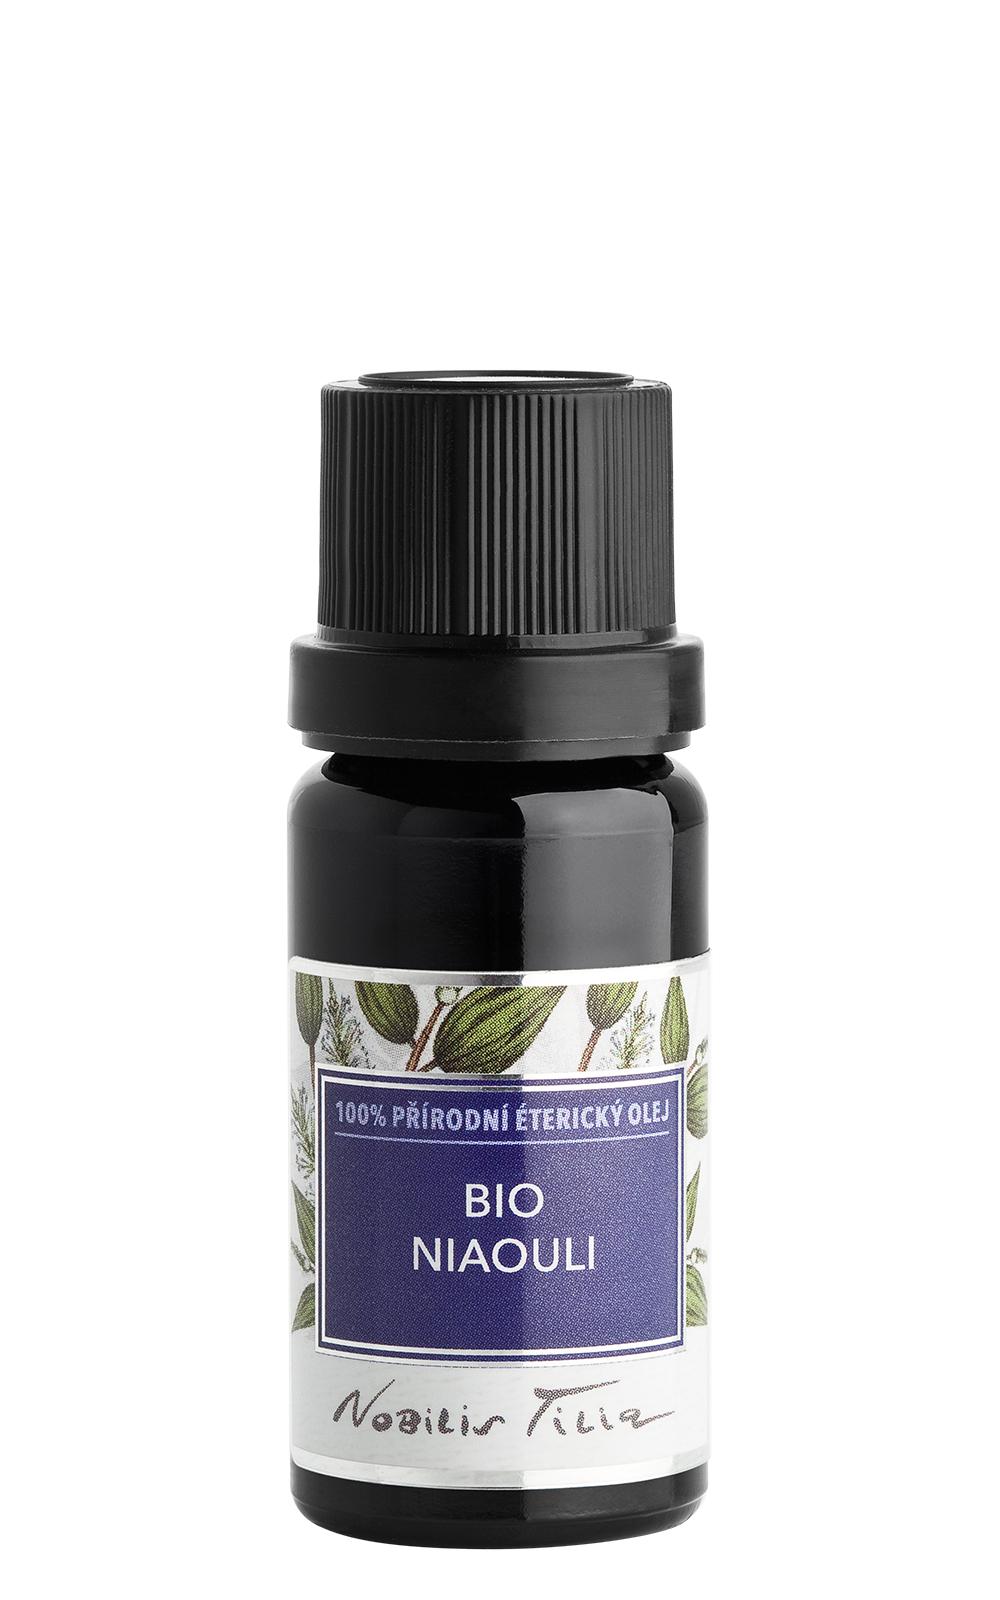 Nobilis Tilia Nobilis, Éterický olej Bio Niaouli 10 ml